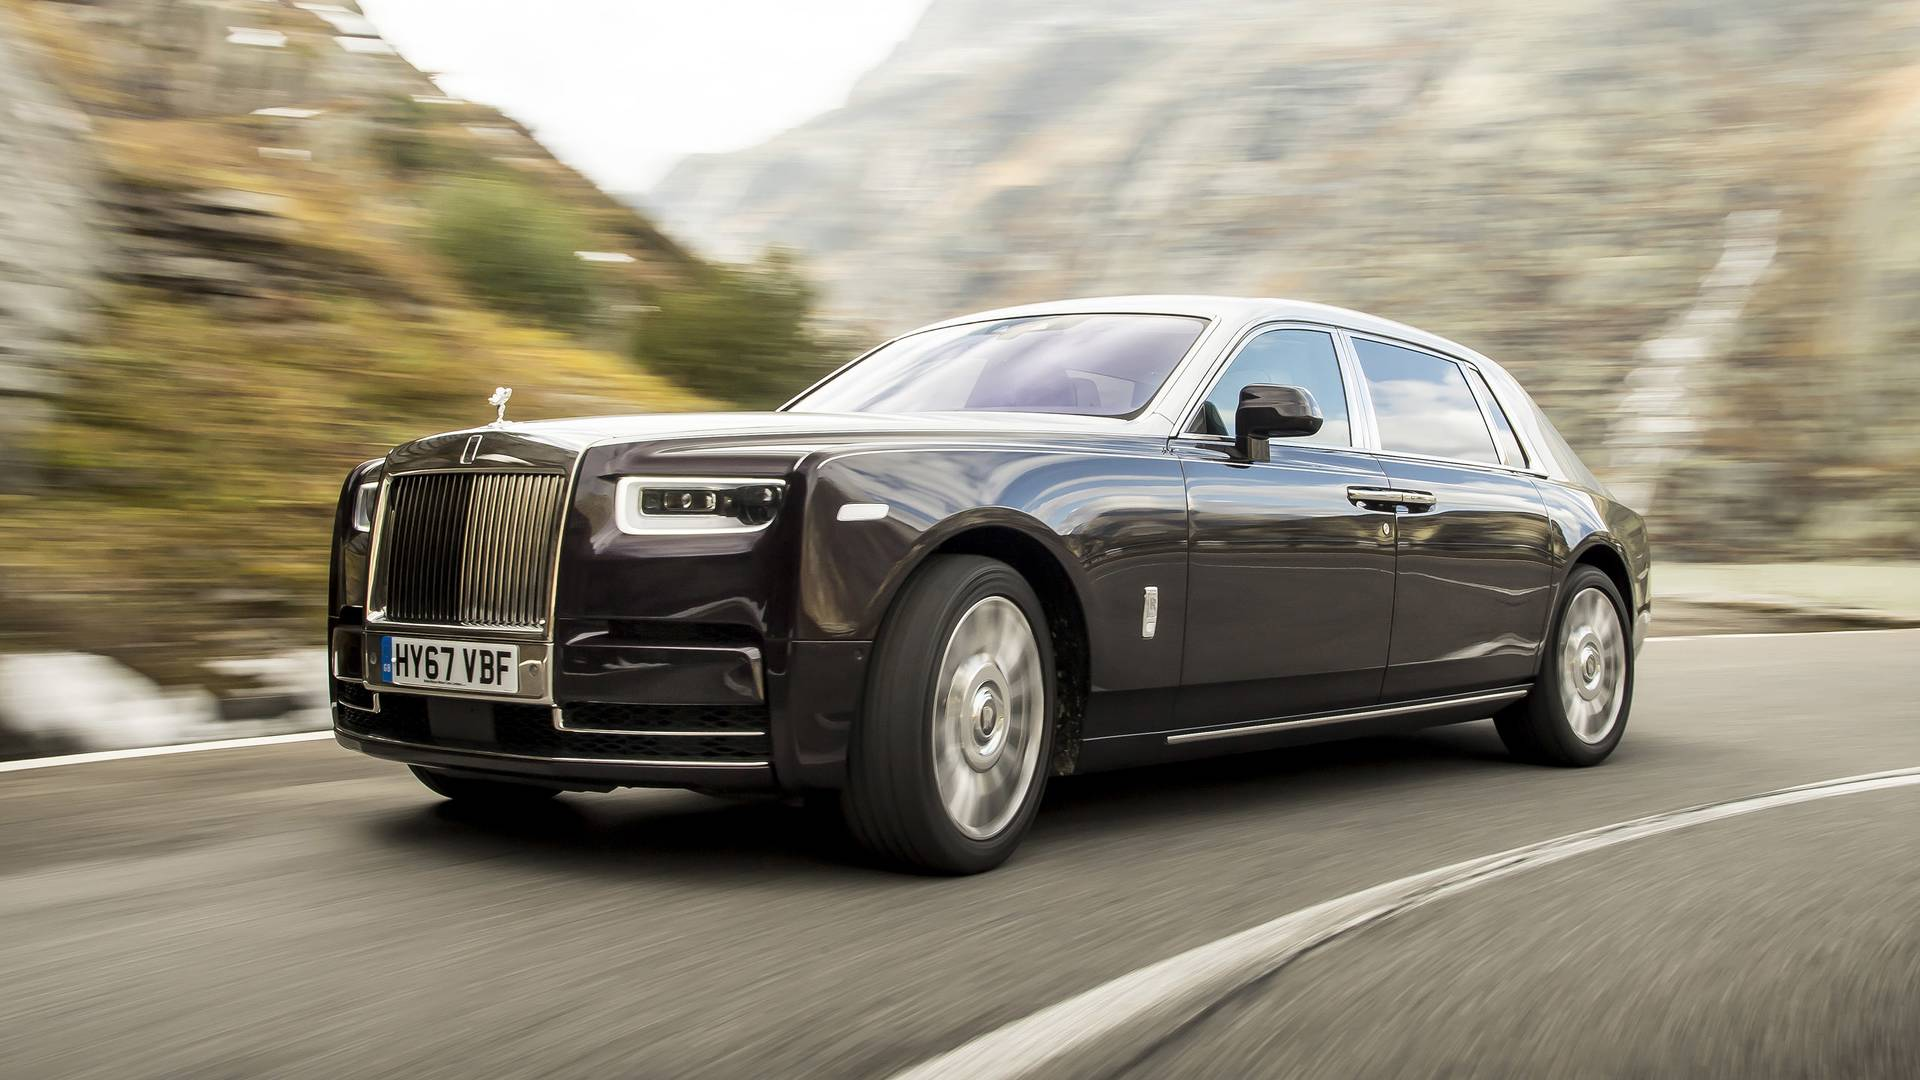 2018 rolls royce phantom ewb first drive best gets better for Rolls royce phantom motor